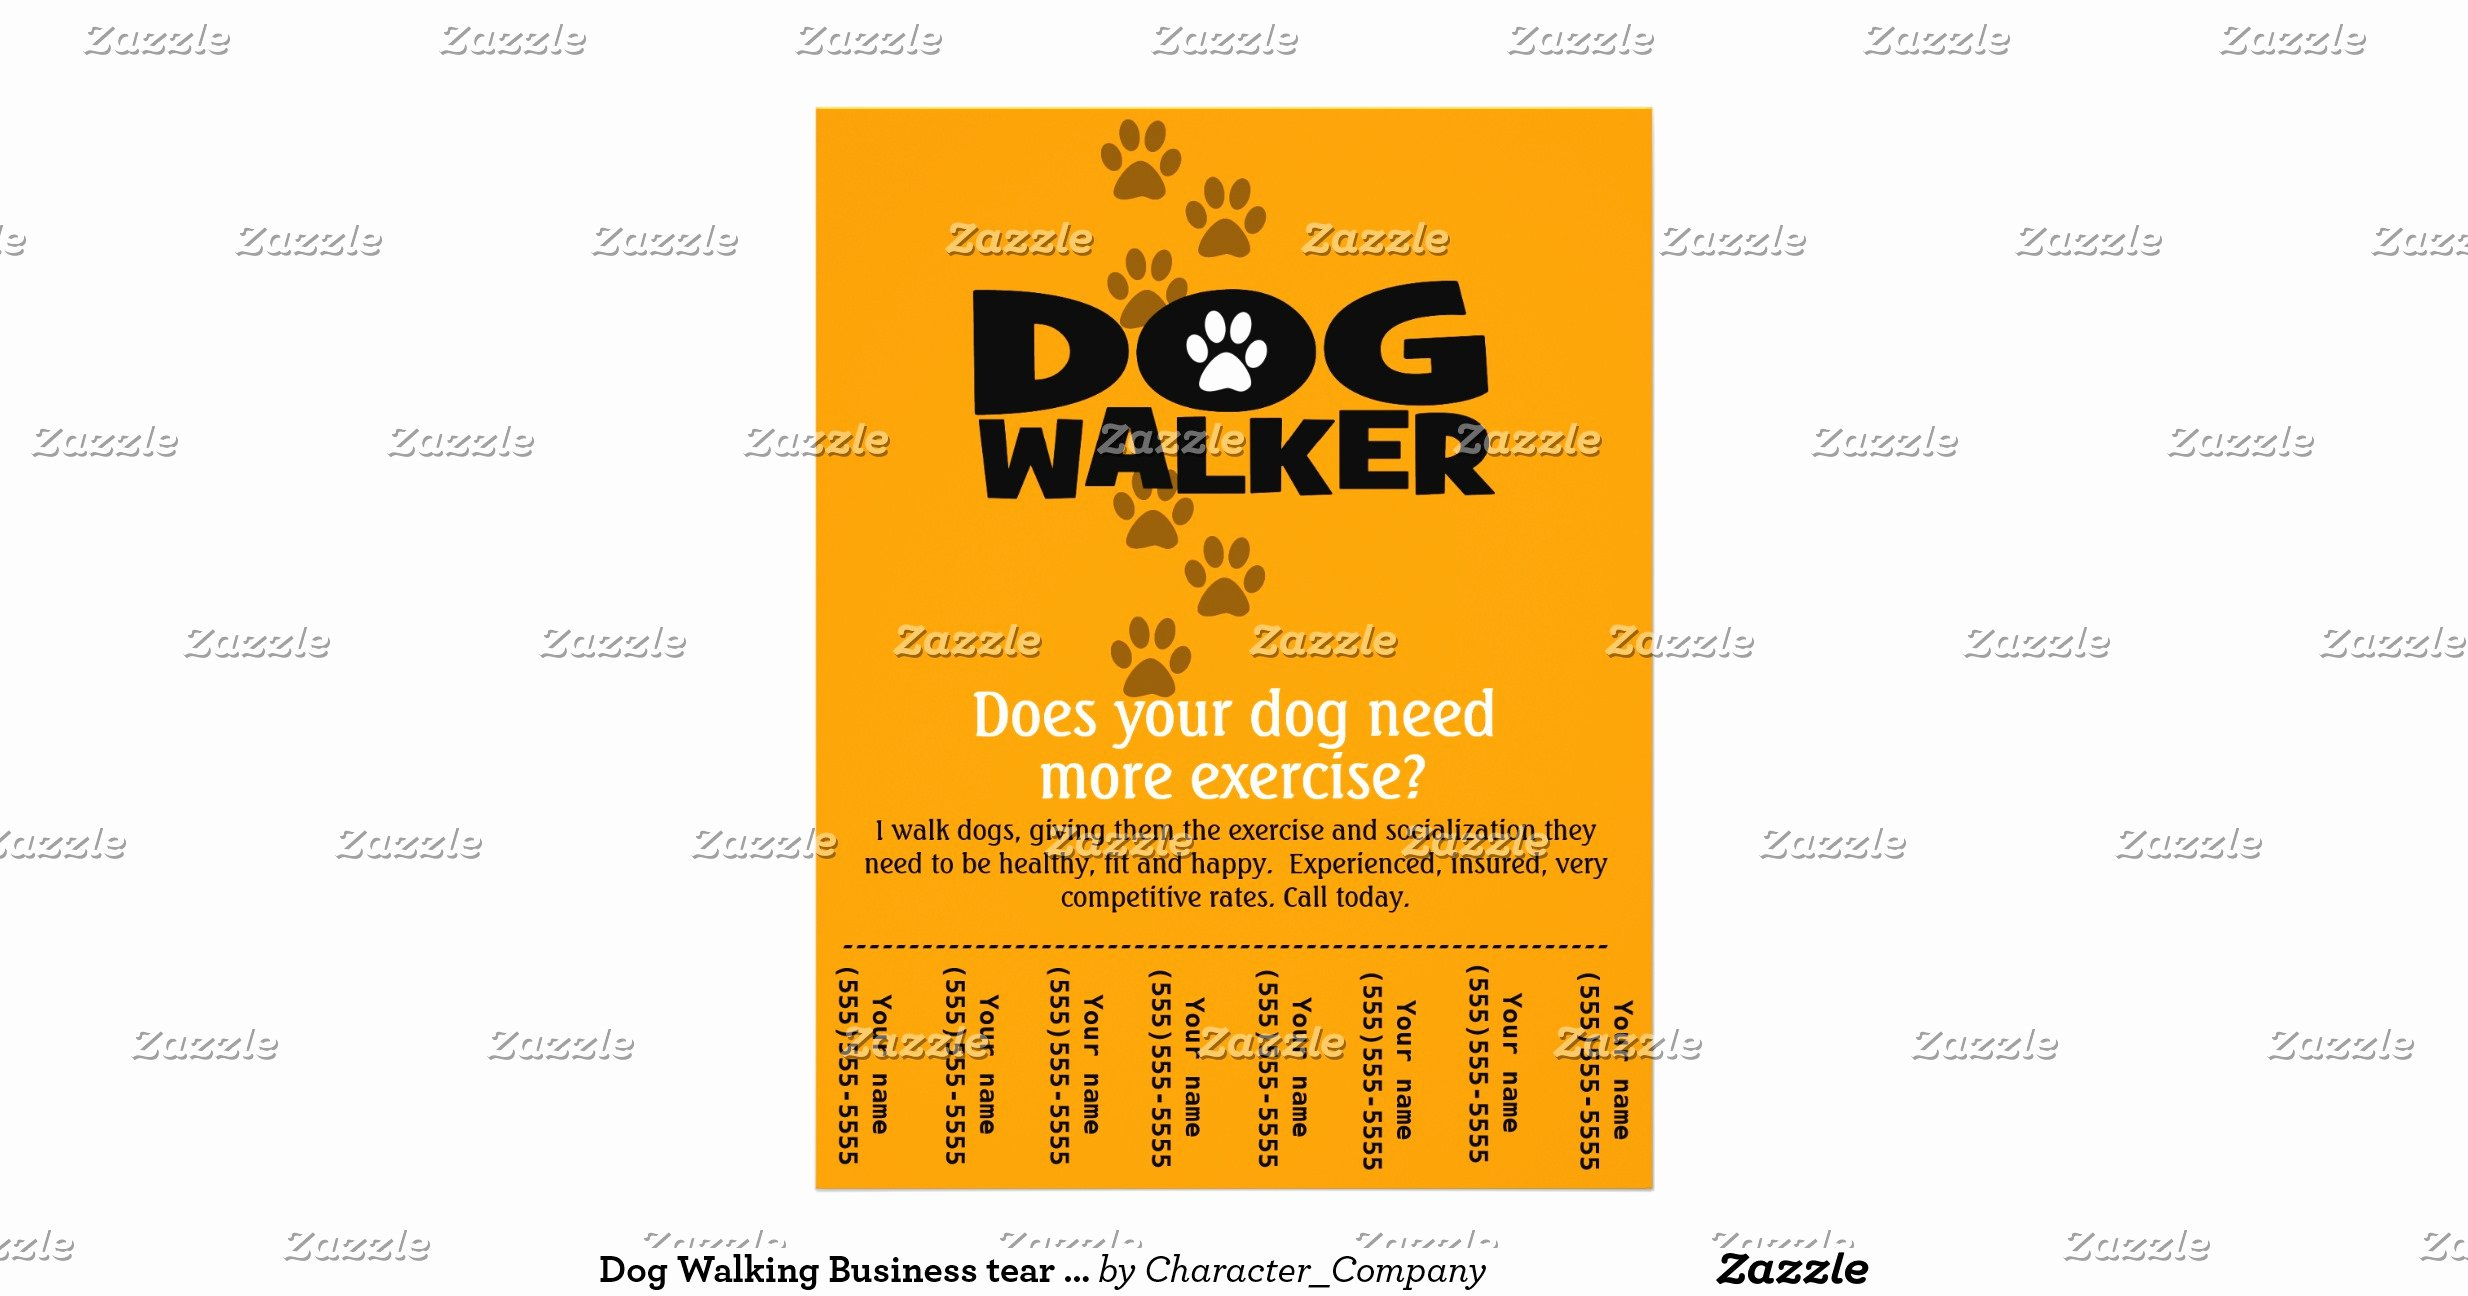 Dog Walking Flyer Template New Dog Walking Business Tear Sheet Flyer Template Rddb2fce081c149e3bd1cff9c438a0ac4 Vgvyf 8byvr